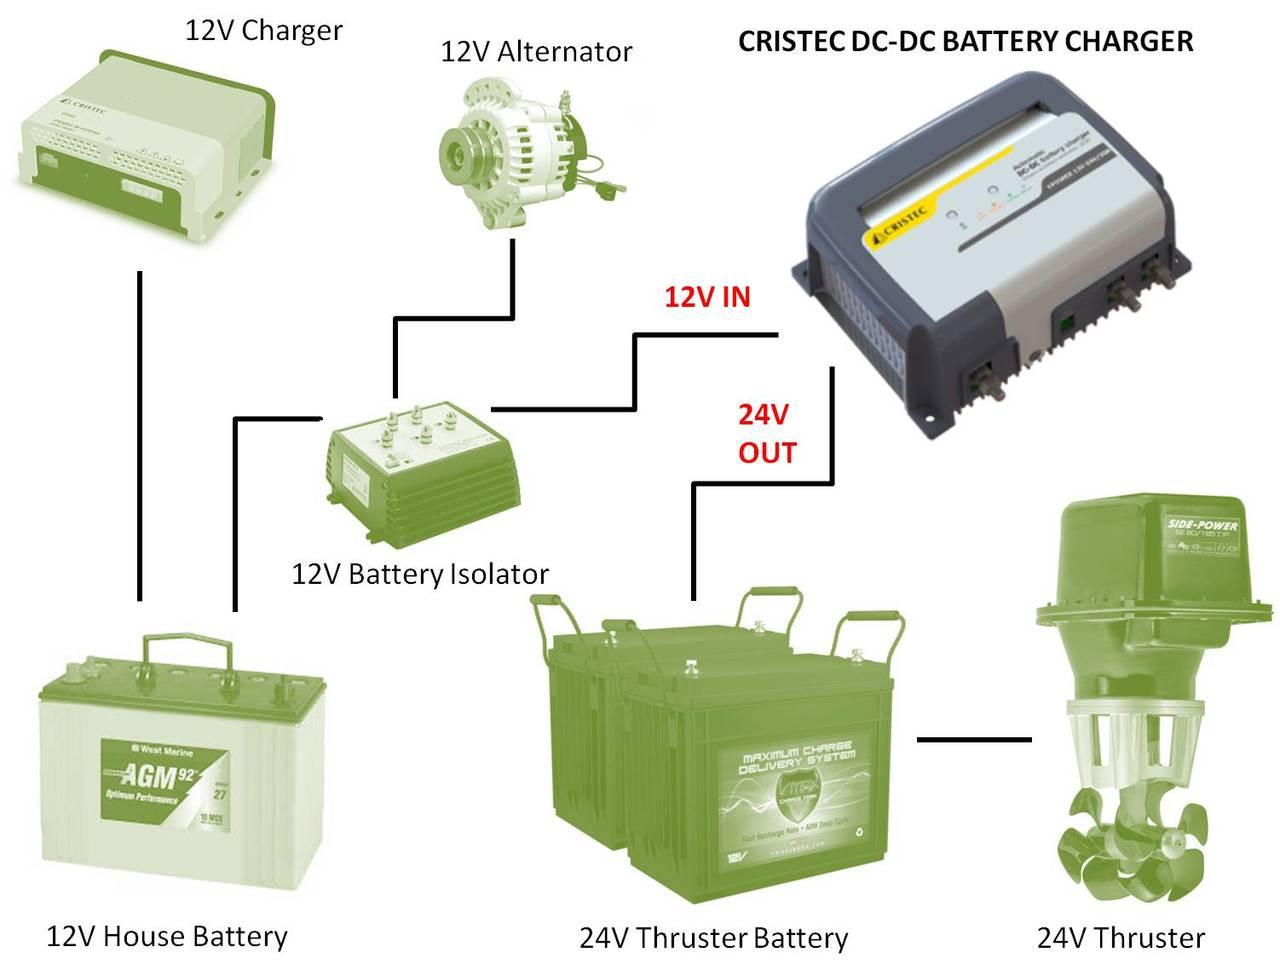 Cristec 12V to 24V DC Multistage DC-DC Boost Converter Battery Charger